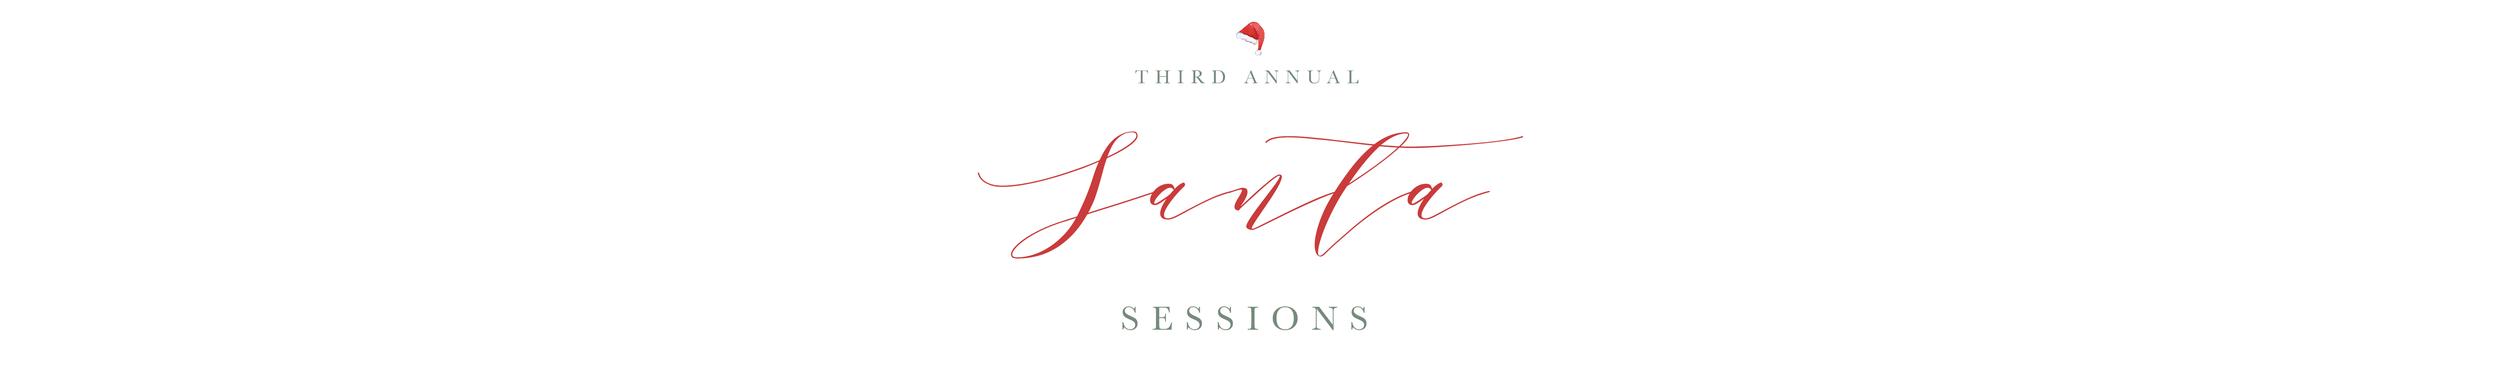 santa_mini_sessions.png